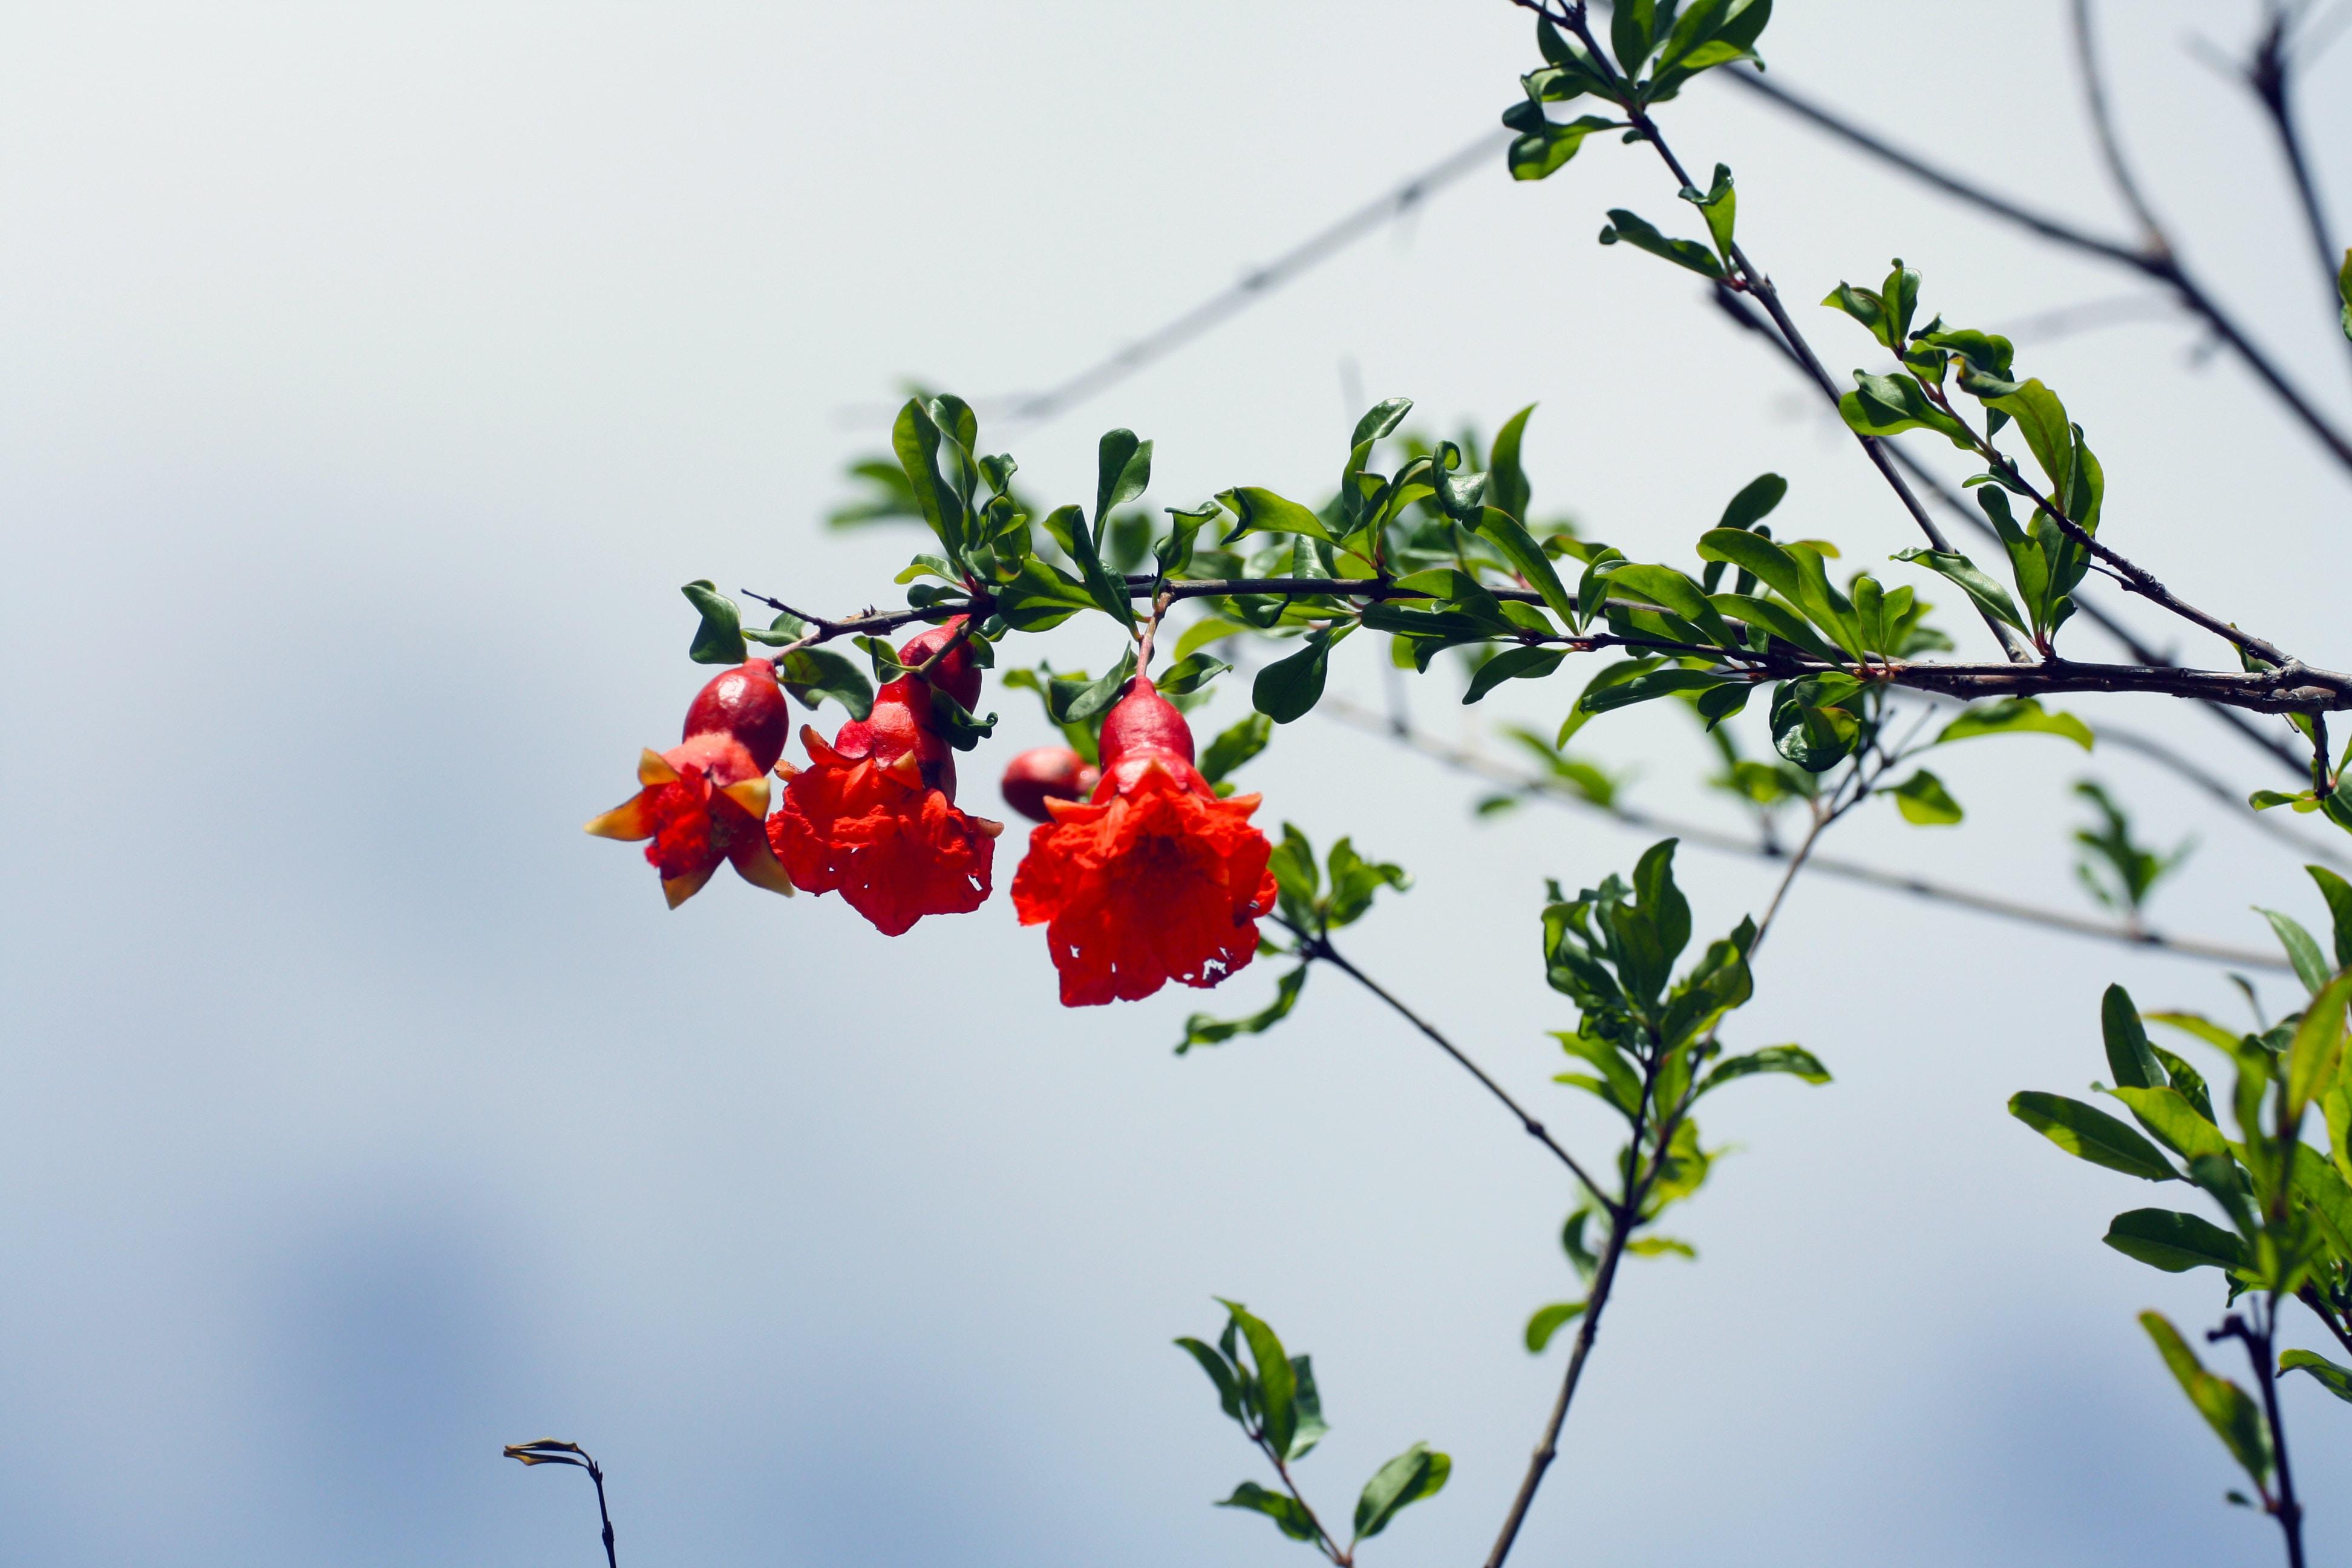 red flower on brown stem